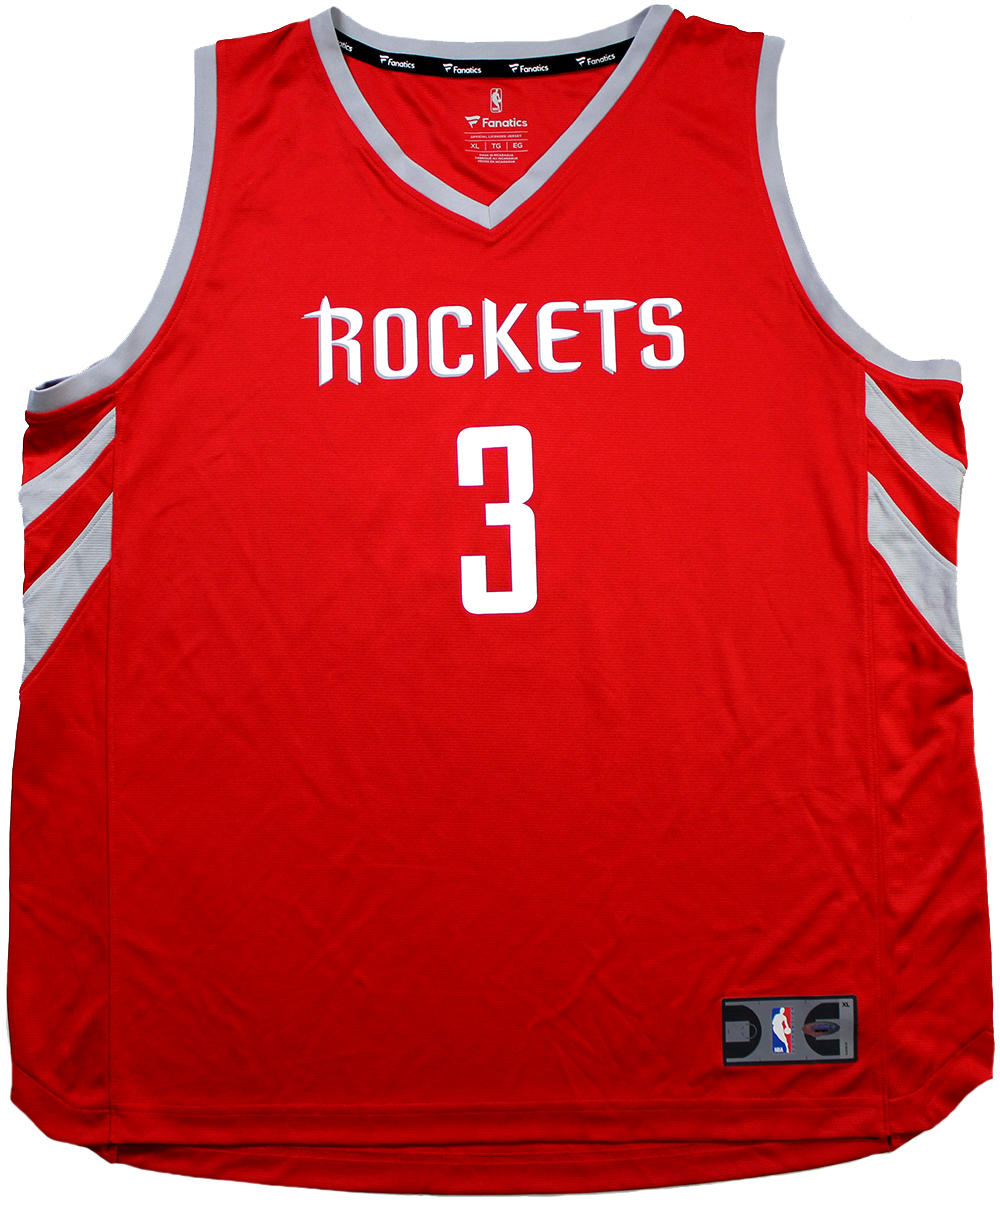 9077a0e1b7d ... houston rockets replica jersey